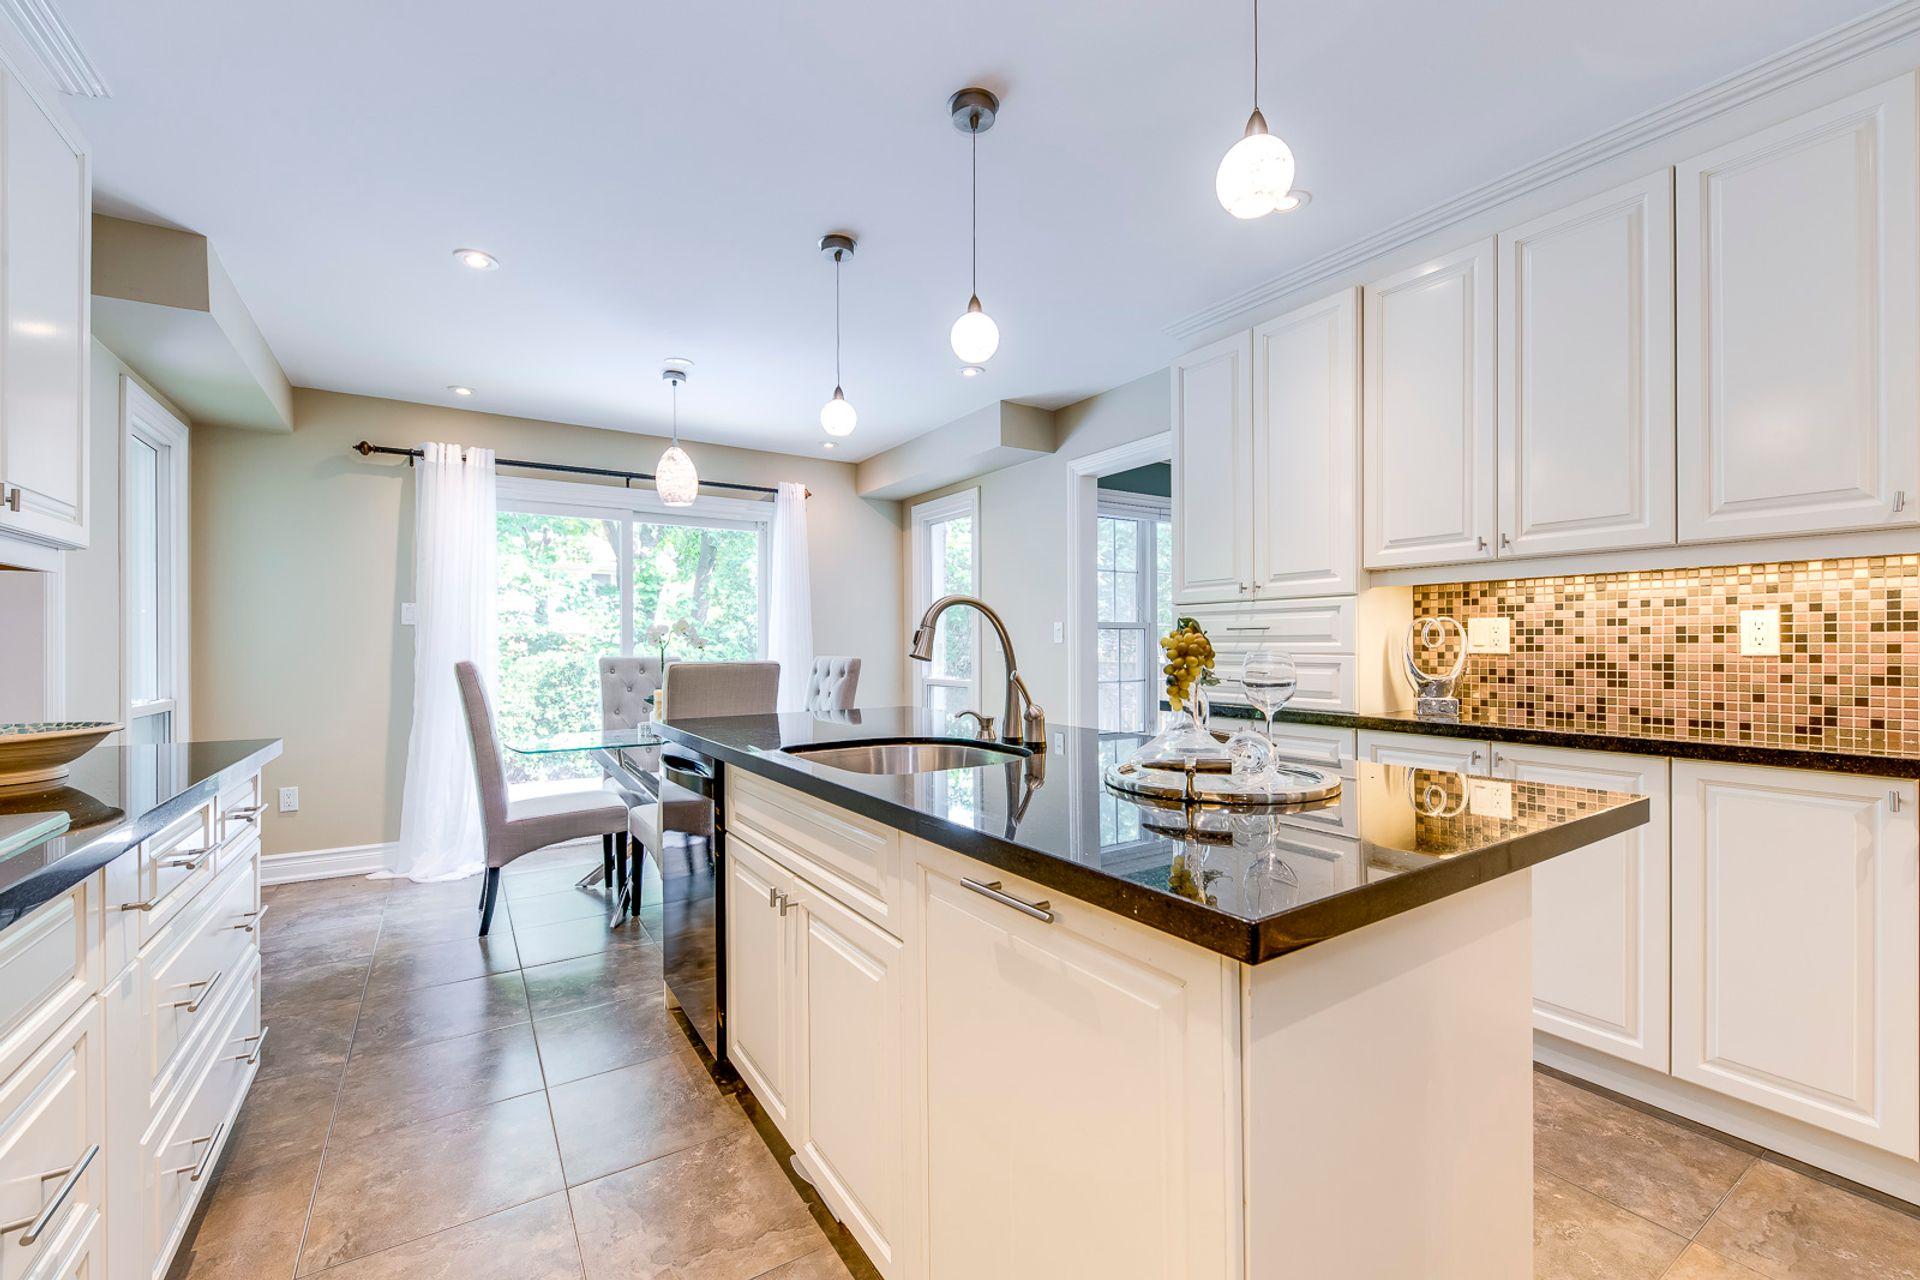 Kitchen - 2180 Dunvegan Ave, Oakville - Elite3 & Team at 2180 Dunvegan Avenue, Eastlake, Oakville